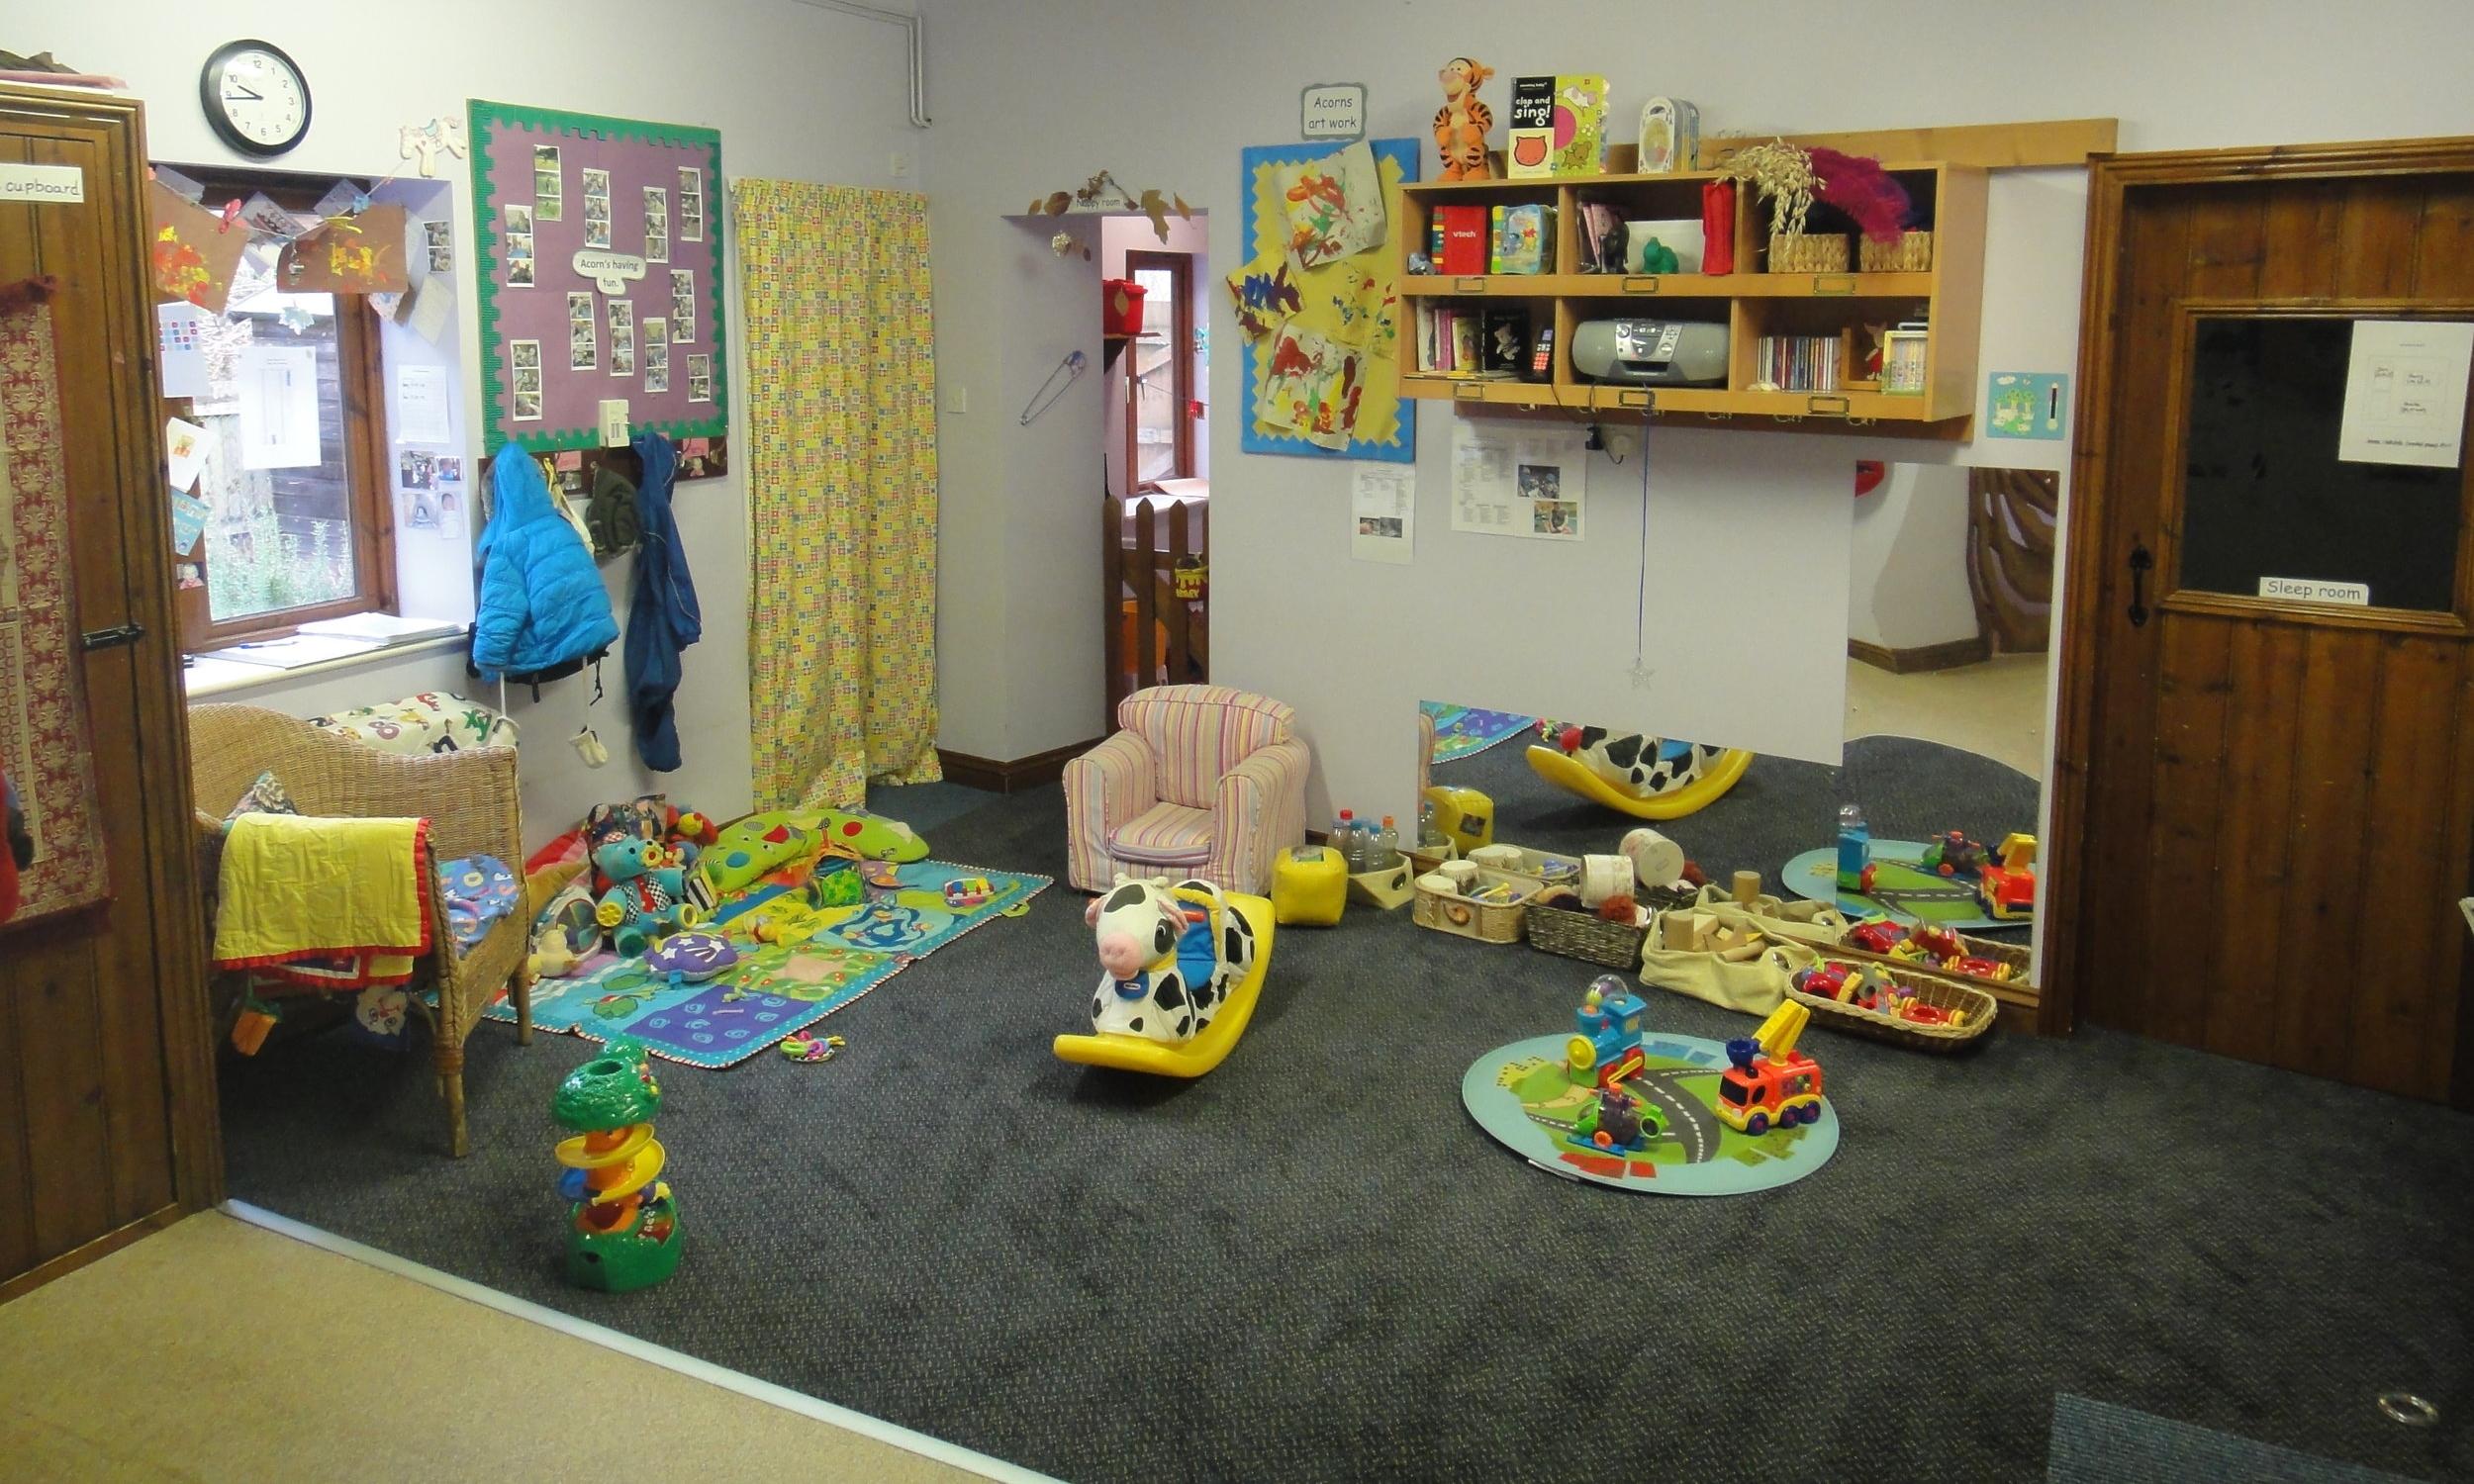 The Acorns' room